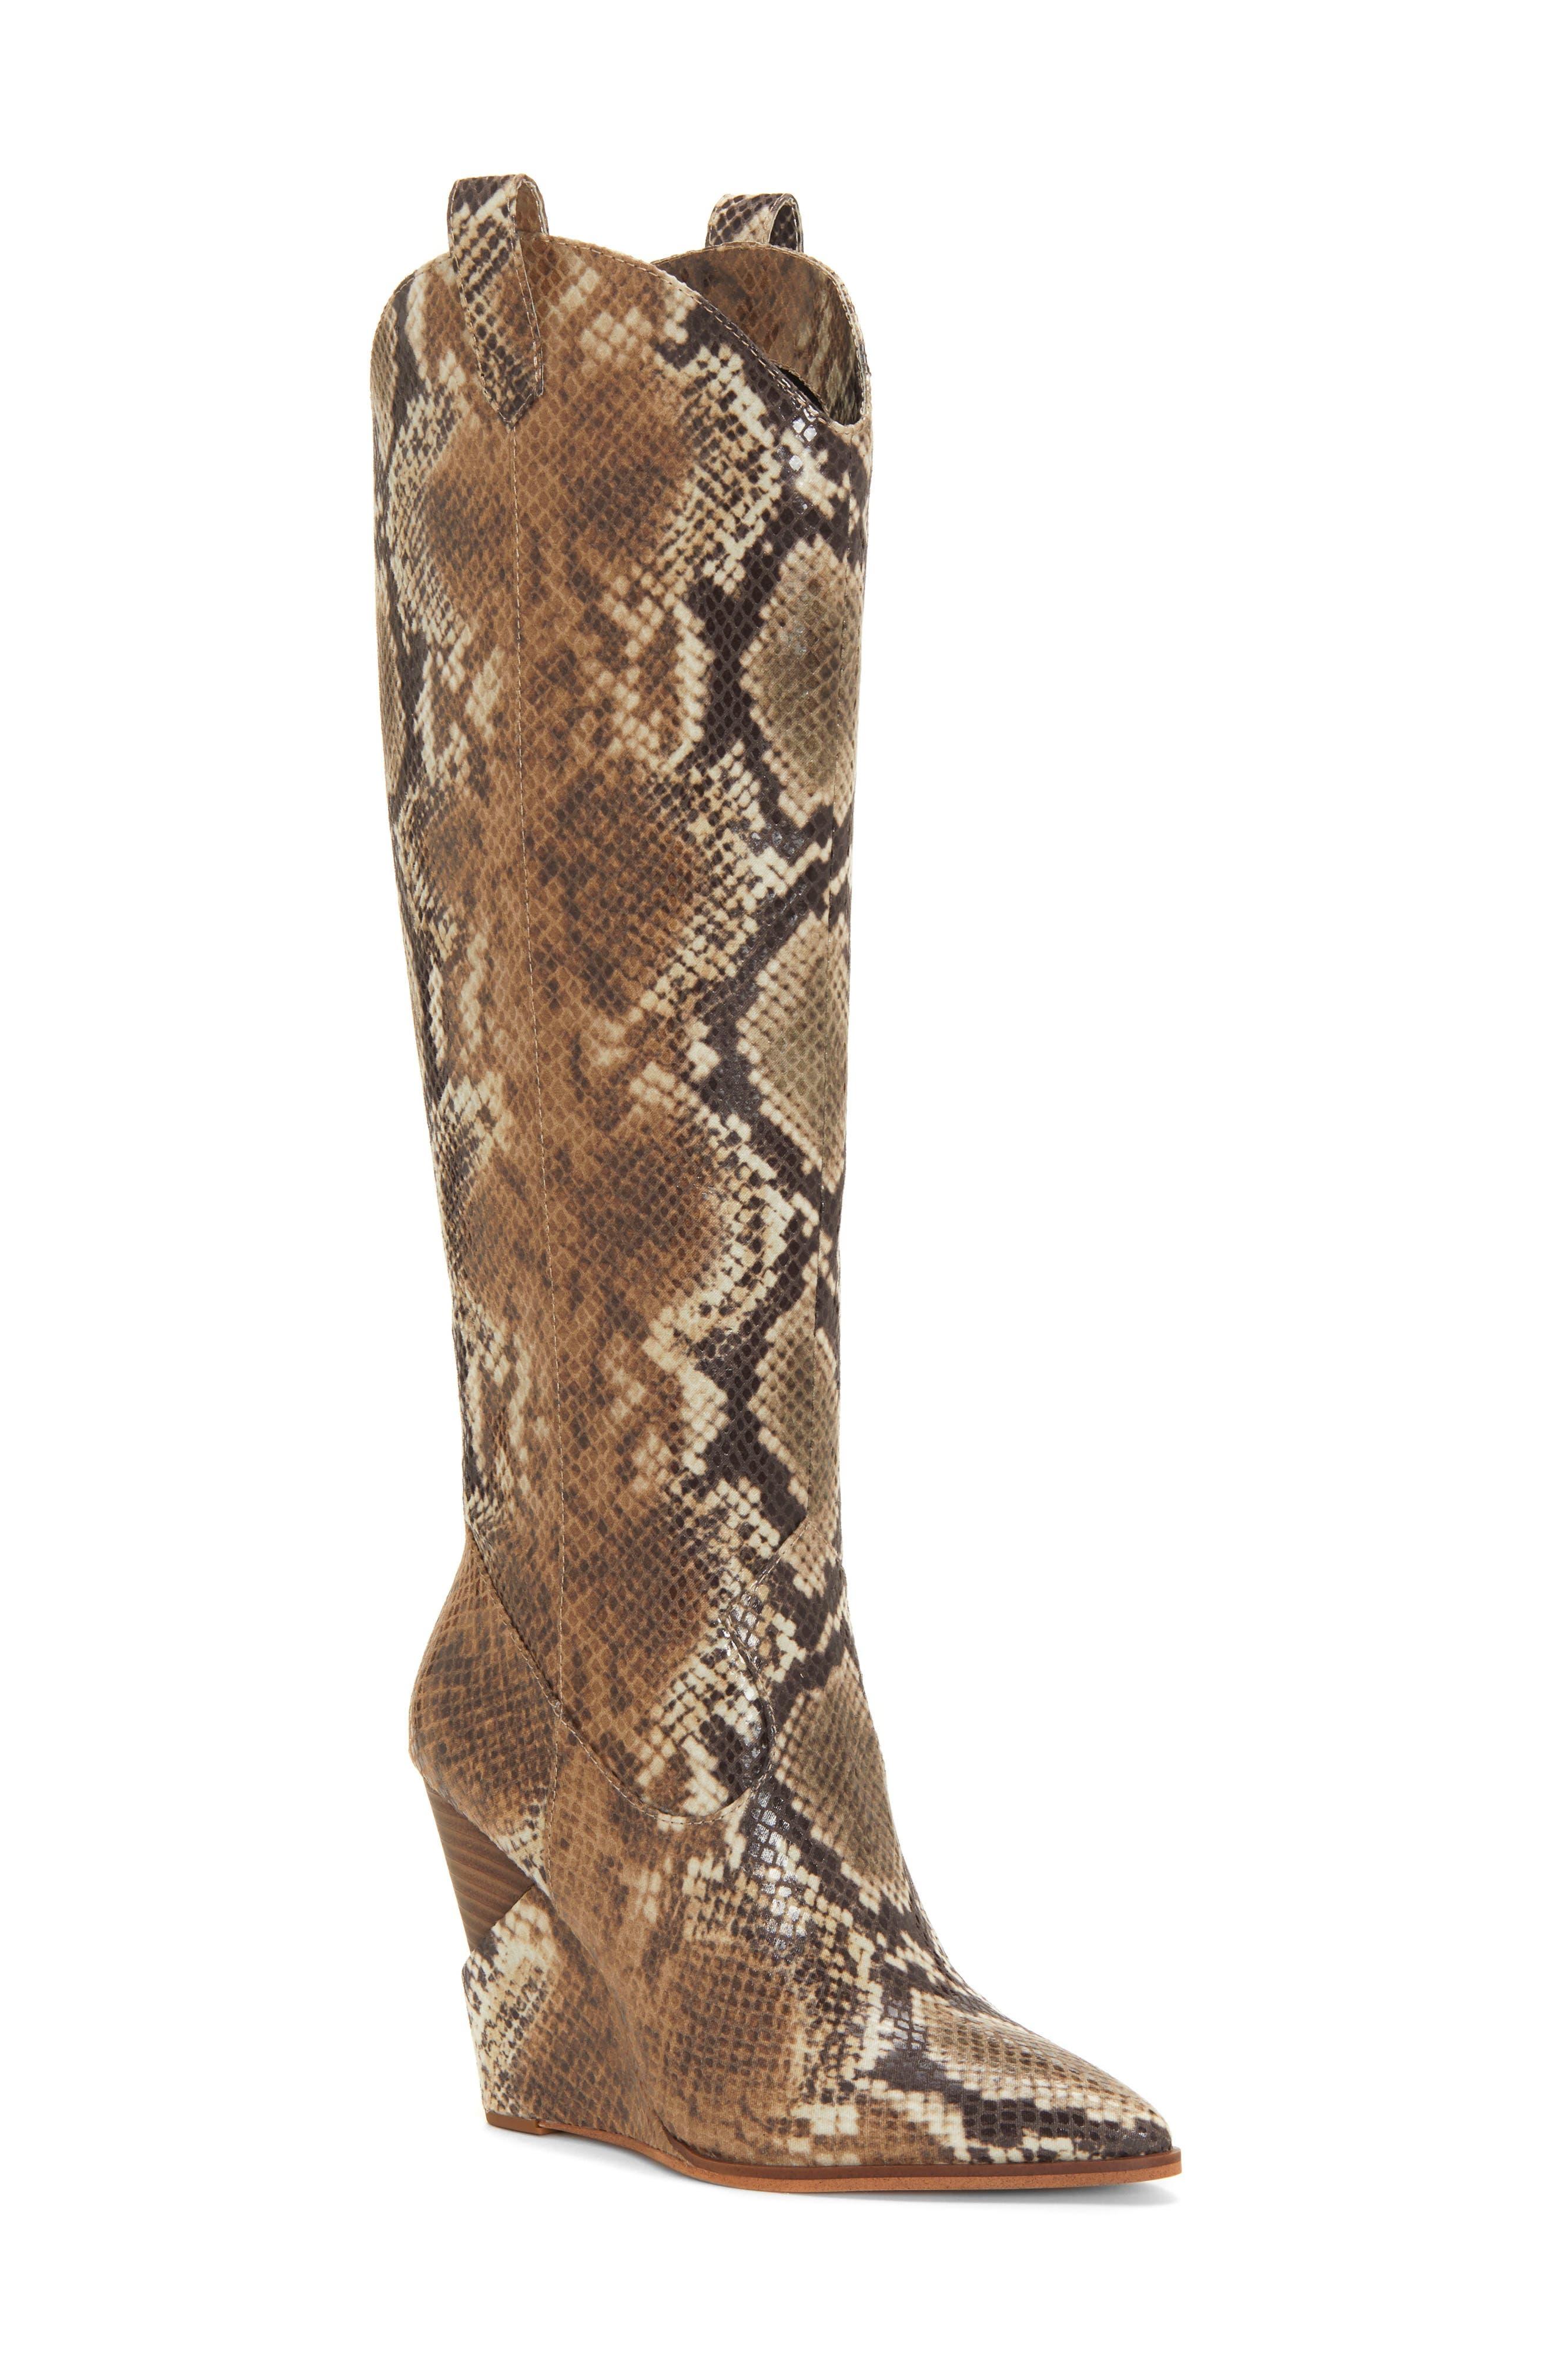 Jessica Simpson Havrie Knee High Boot- Beige